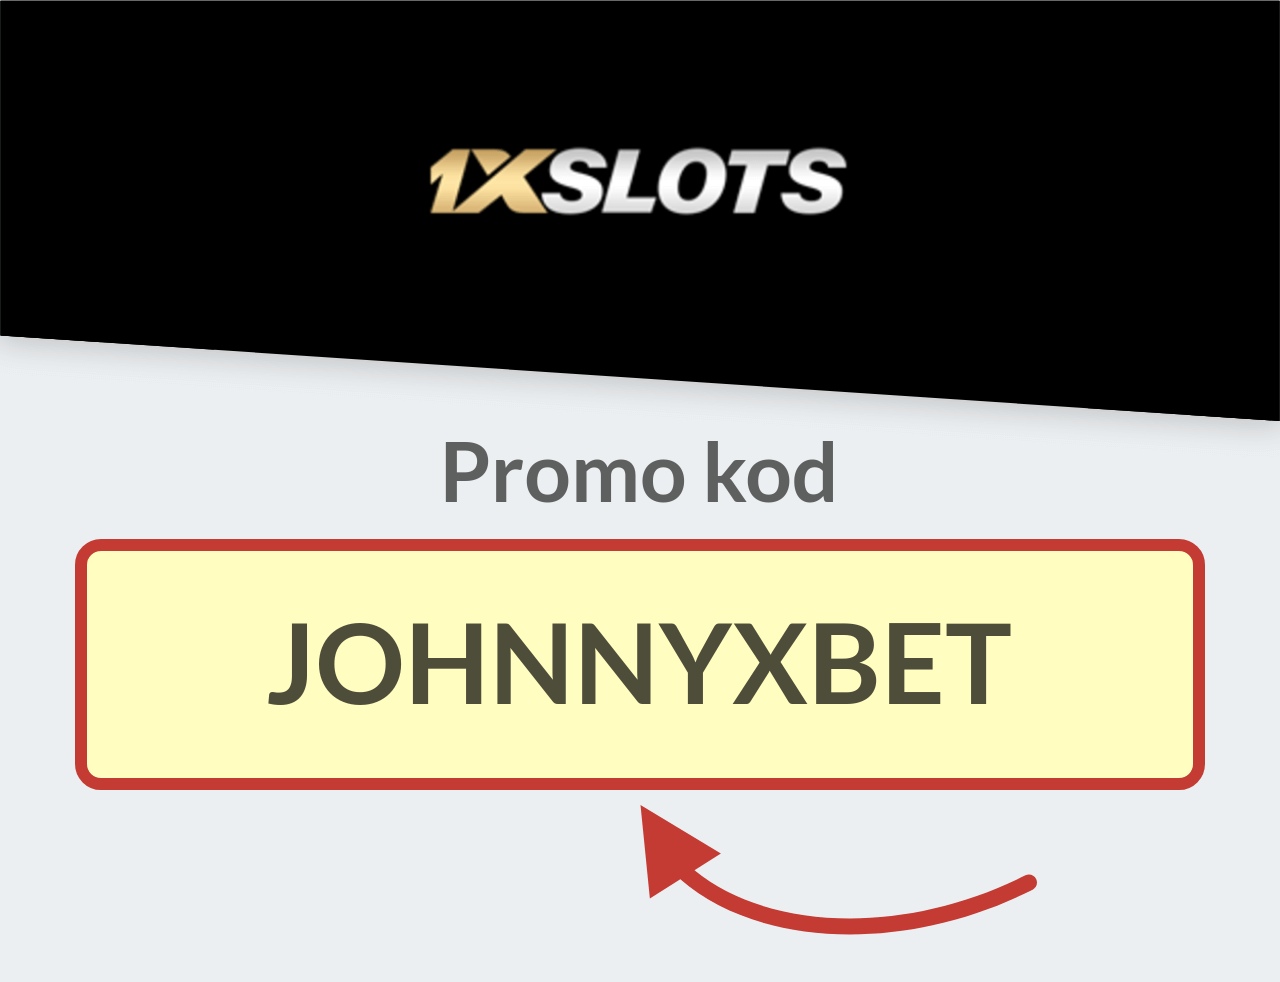 1XSLOTS Promo Kod